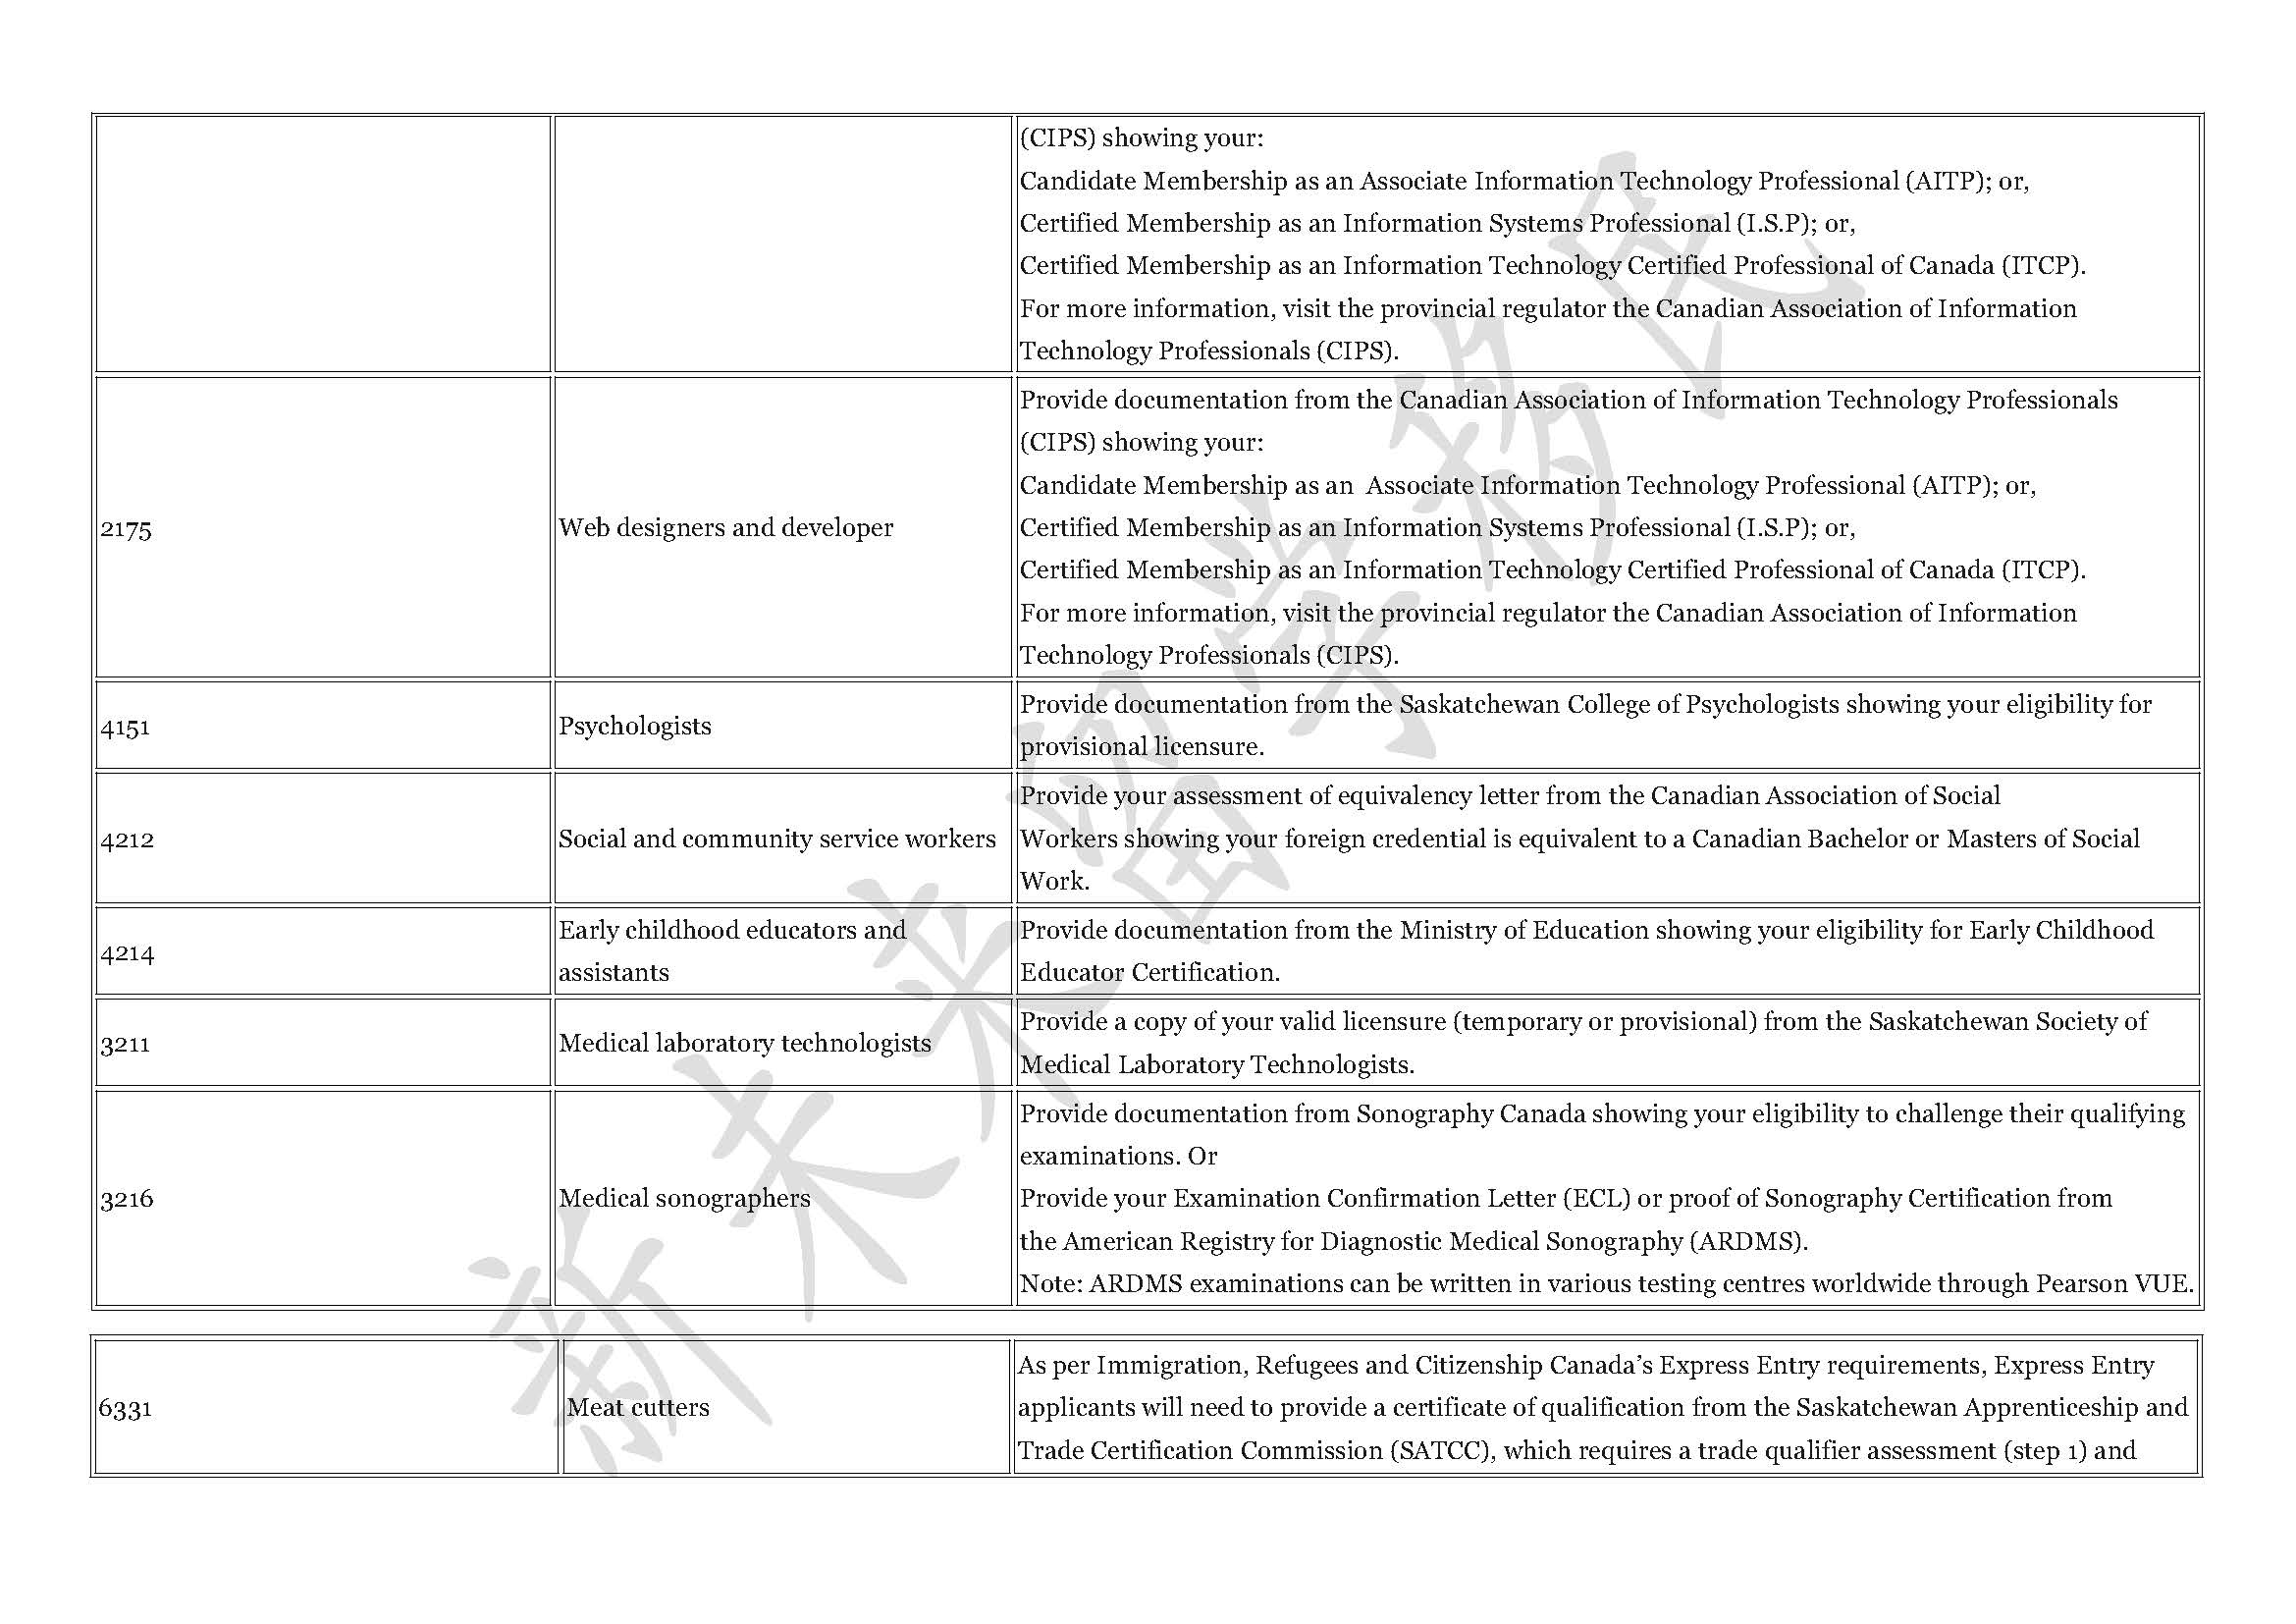 2017.7 occupation list-licensure 2